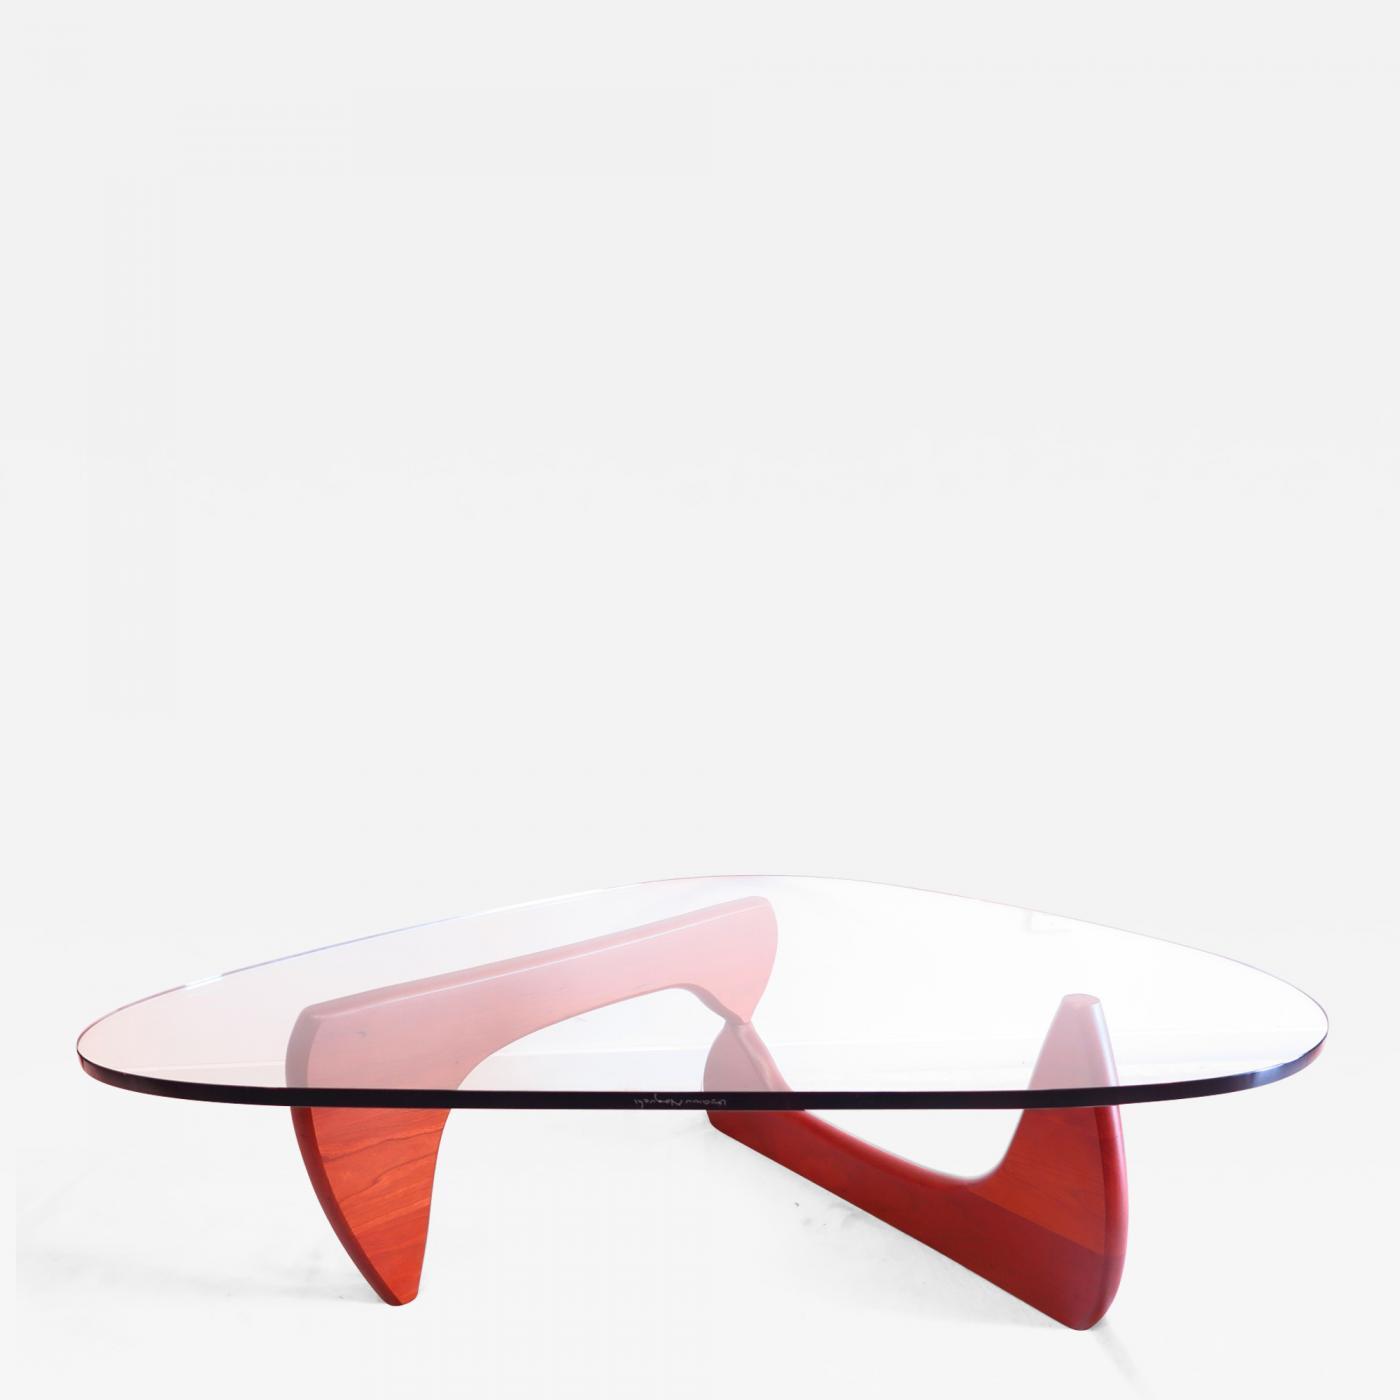 Isamu Noguchi Isamu Noguchi Coffee Table Model In 50